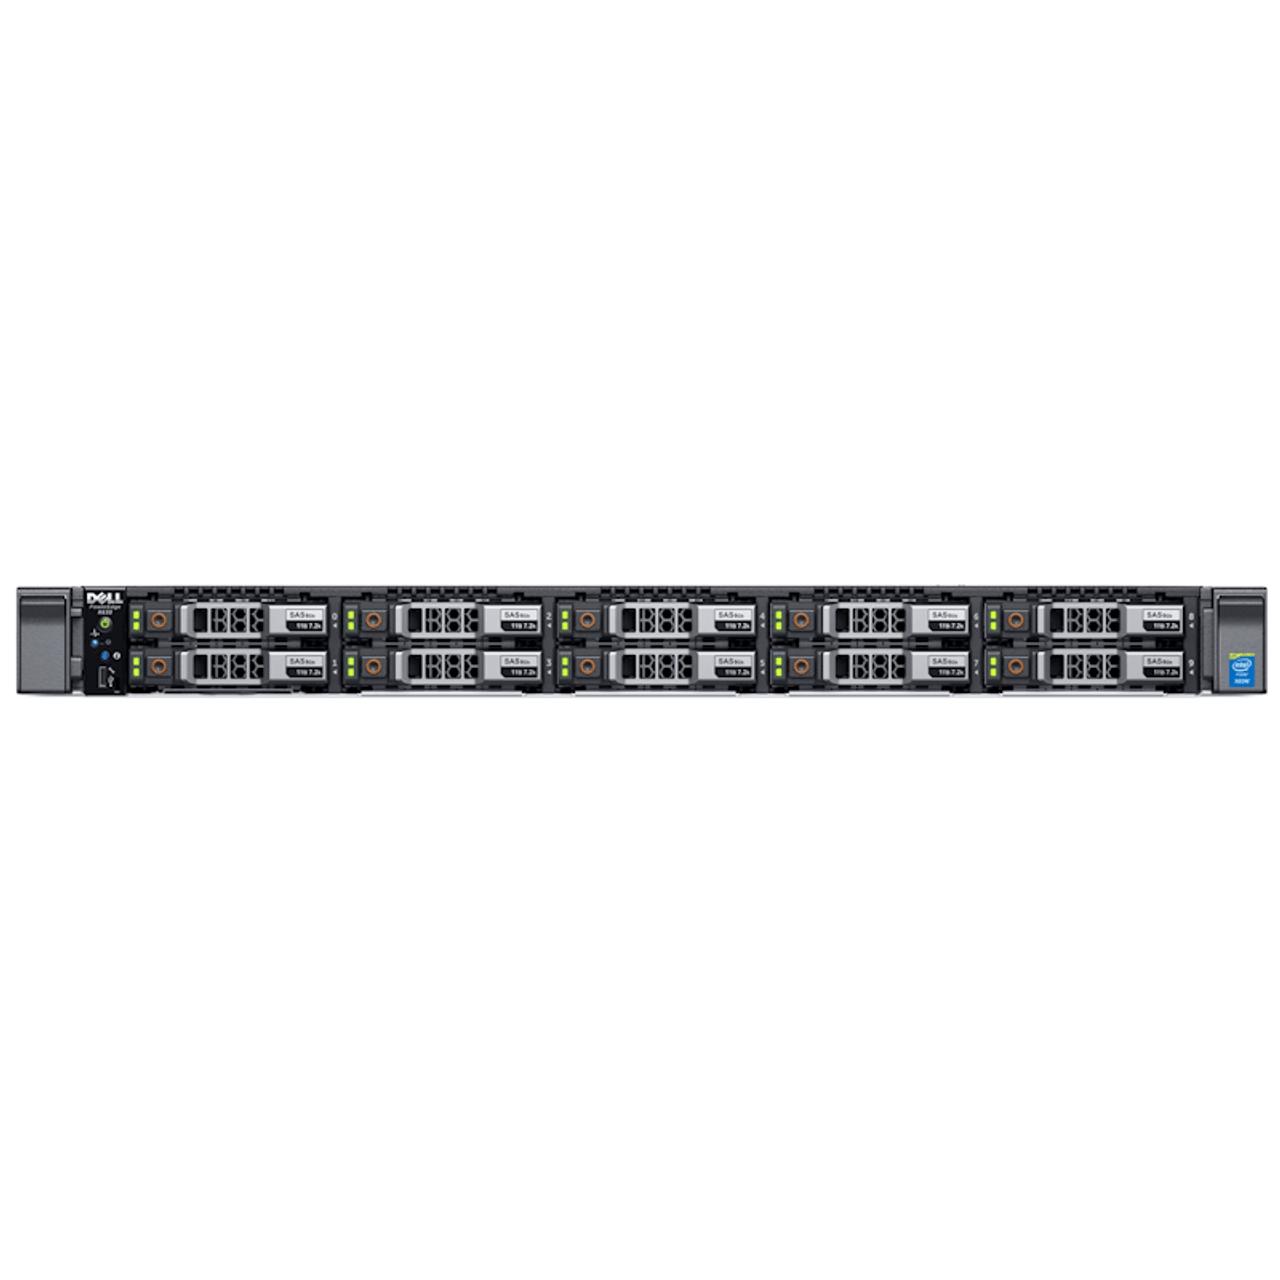 Dell 13G PowerEdge R630 - 10 Bay 2 5